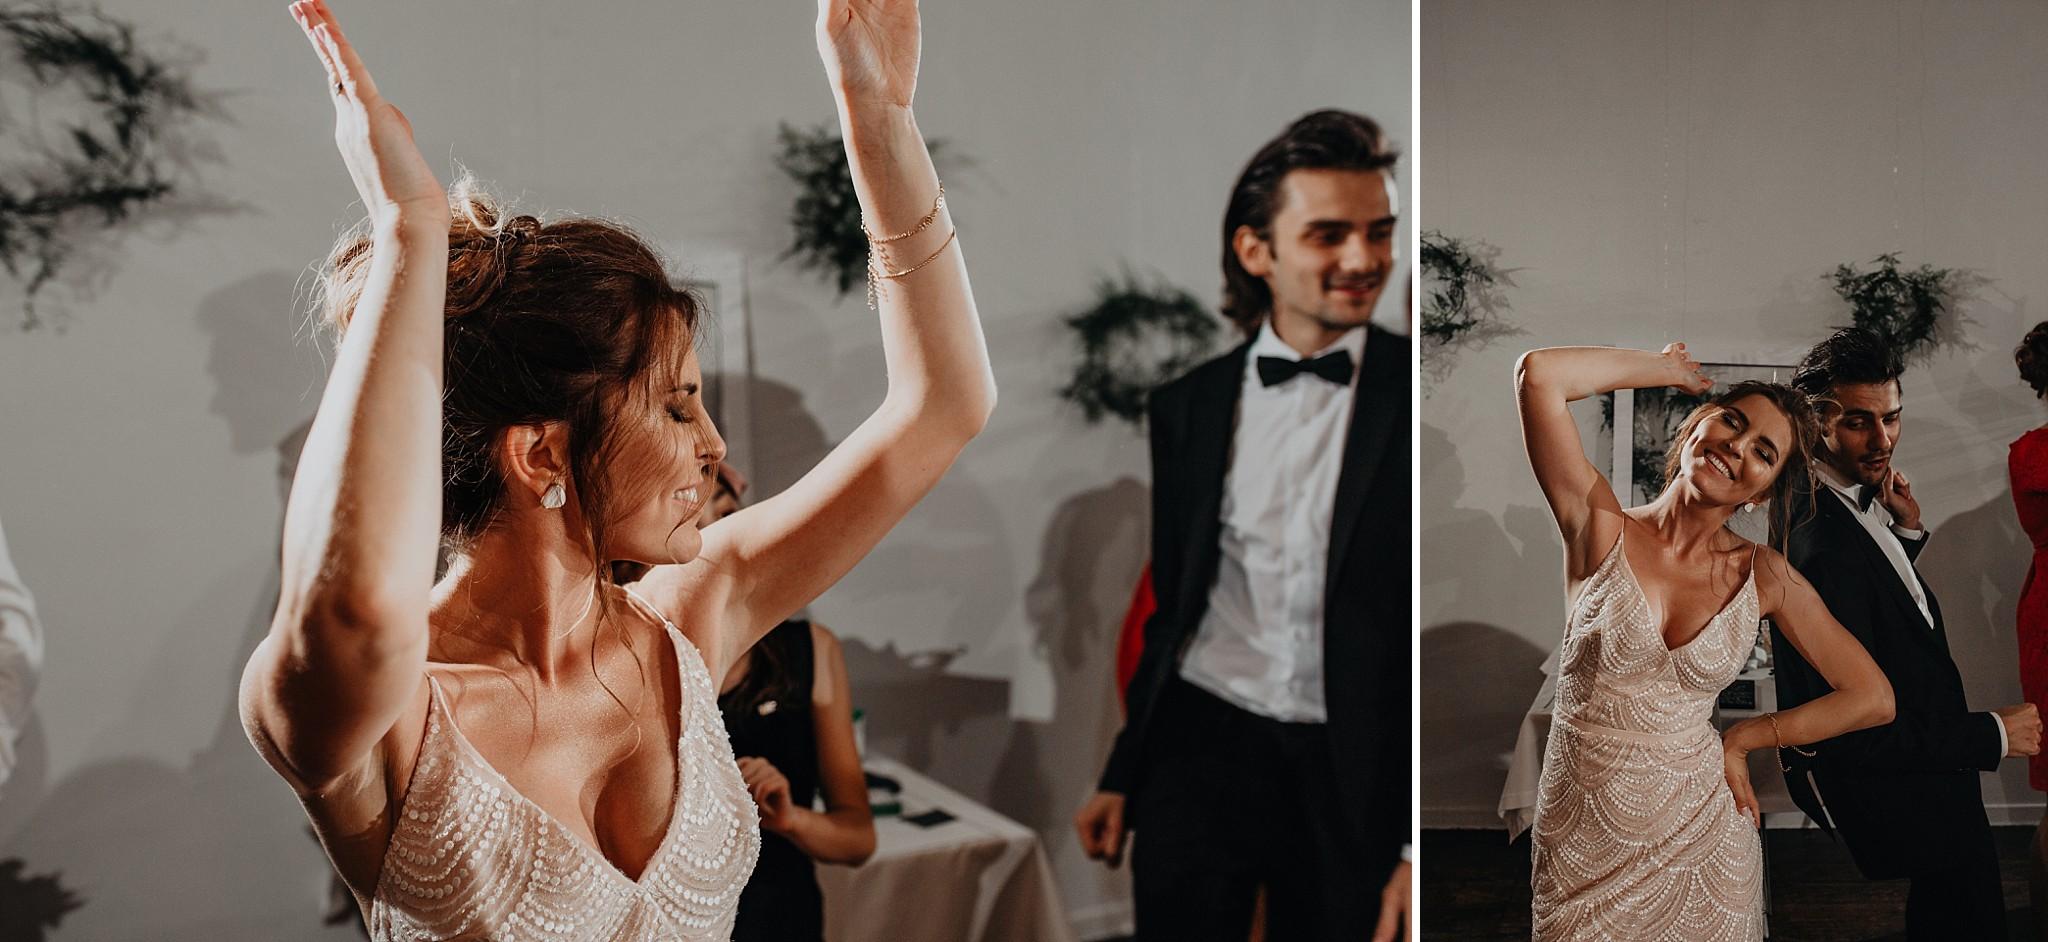 fotograf poznan wesele dobra truskawka piekne wesele pod poznaniem wesele w dobrej truskawce piekna para mloda slub marzen slub koronawirus slub listopad wesele koronawirus 406